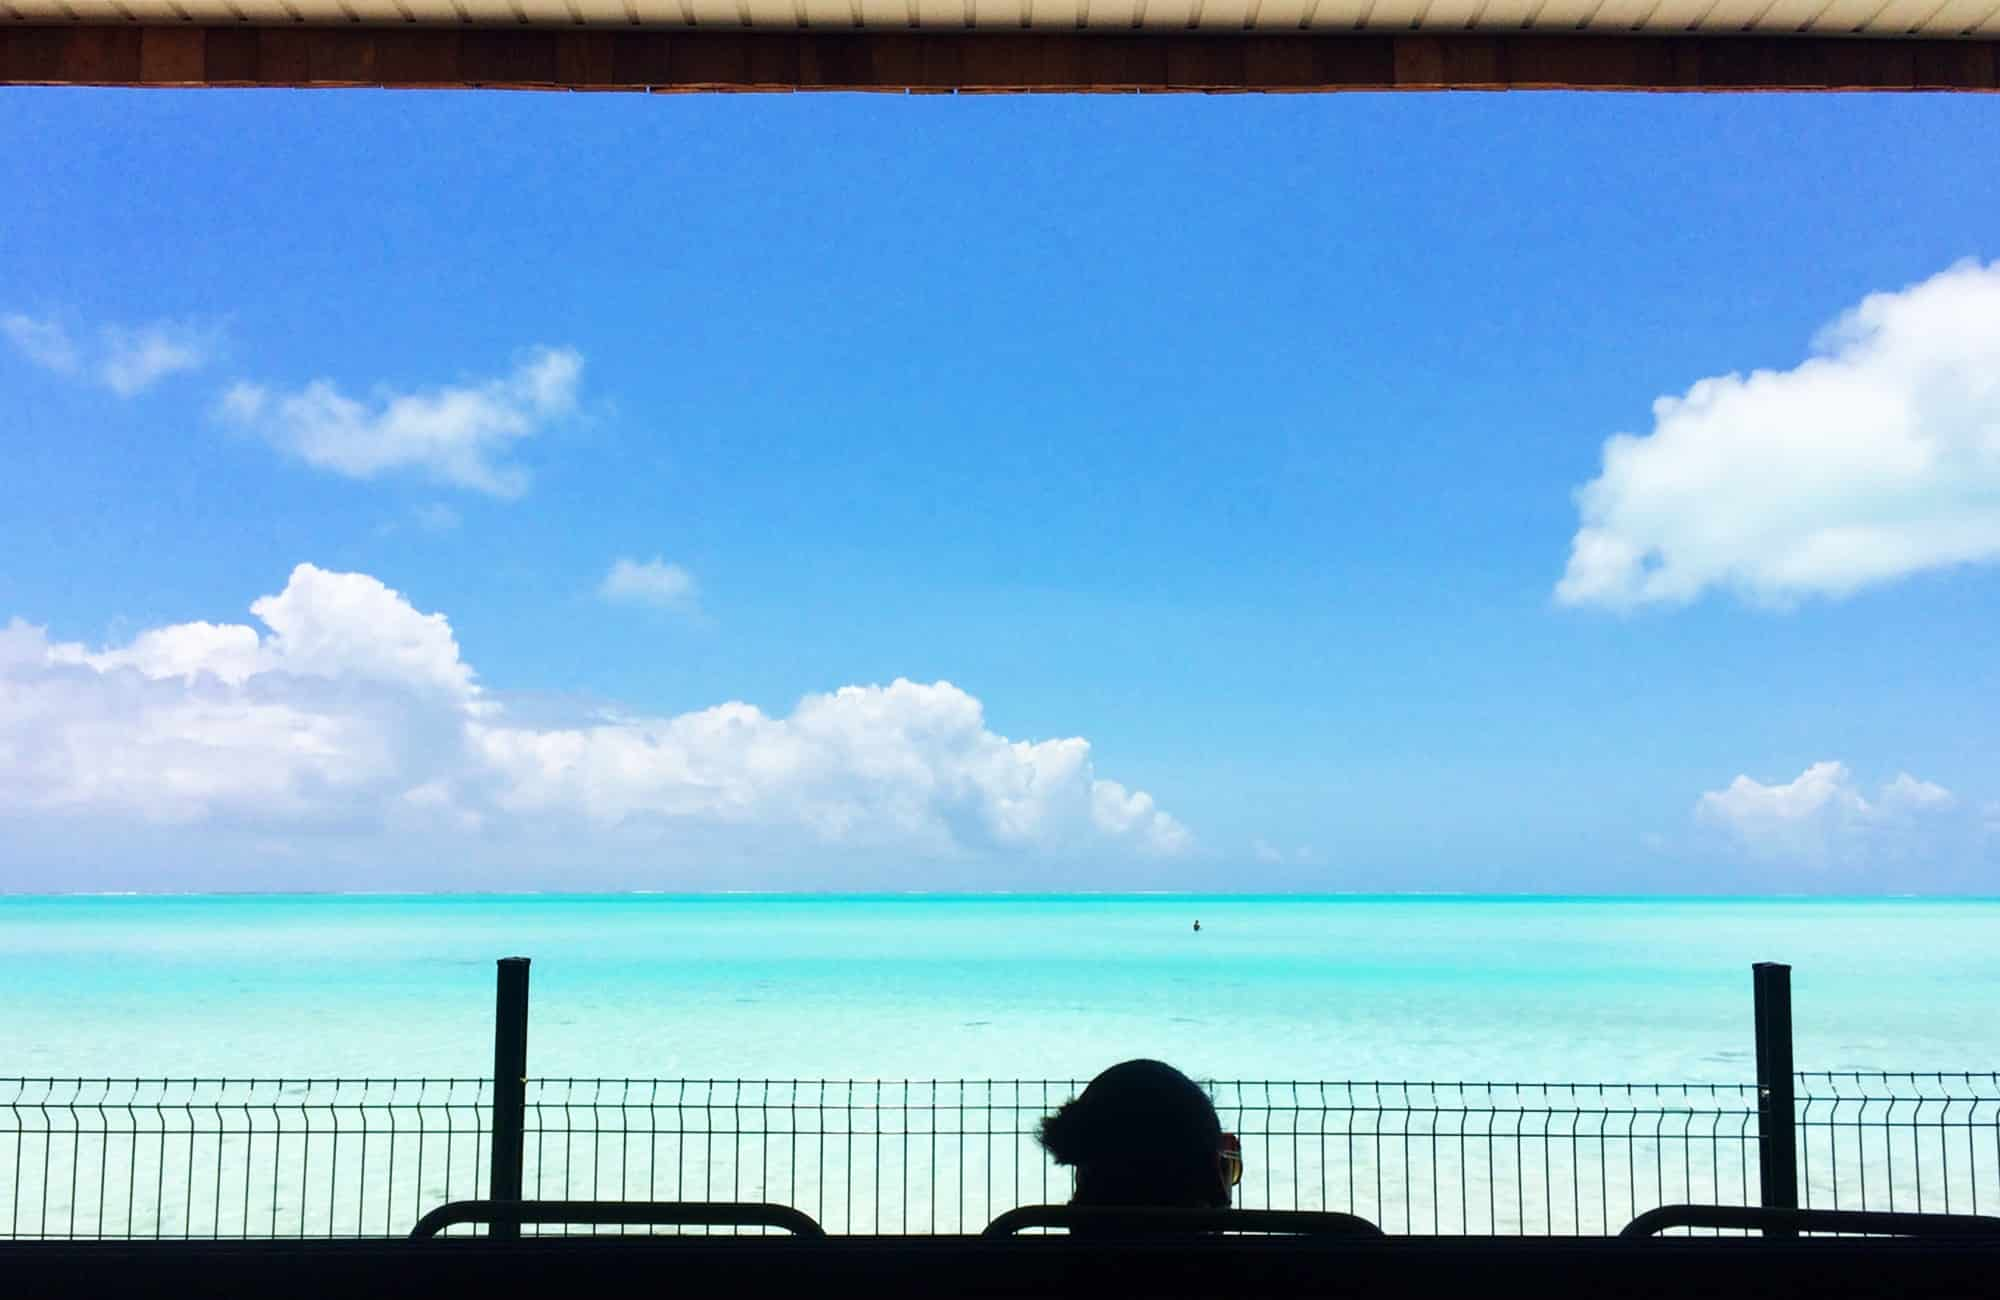 Voyage à Tahiti - Bora-Bora - Amplitudes